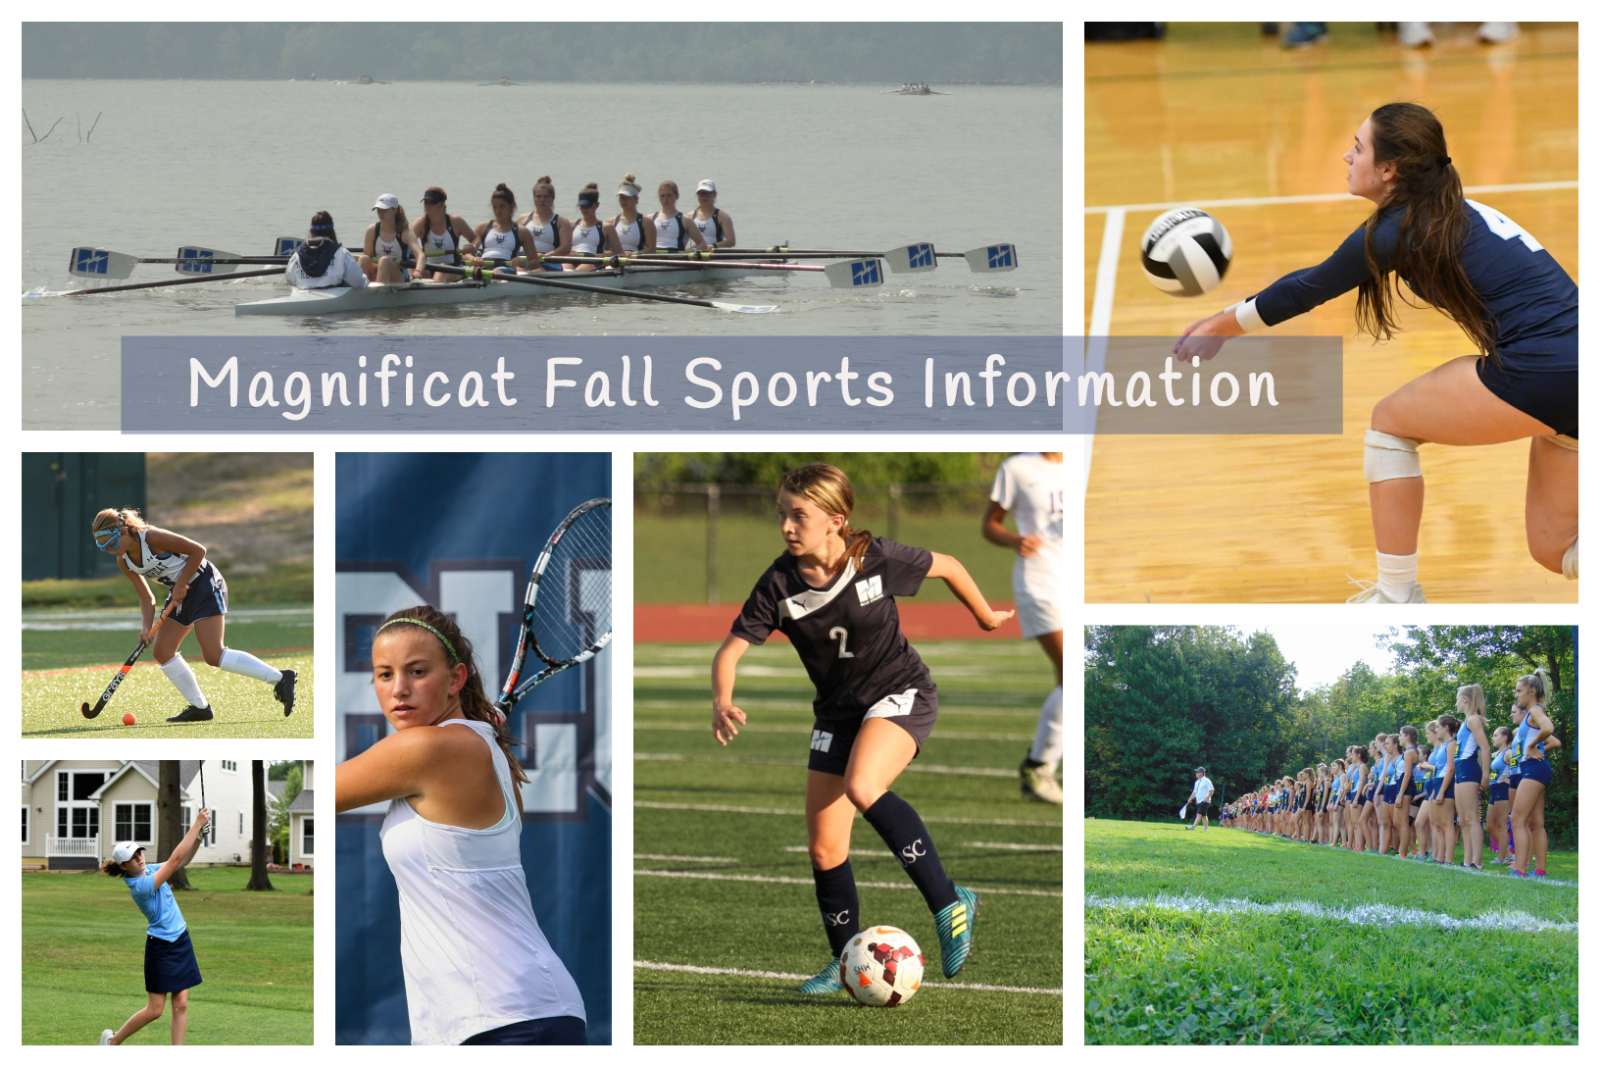 Magnificat Fall Sports Information